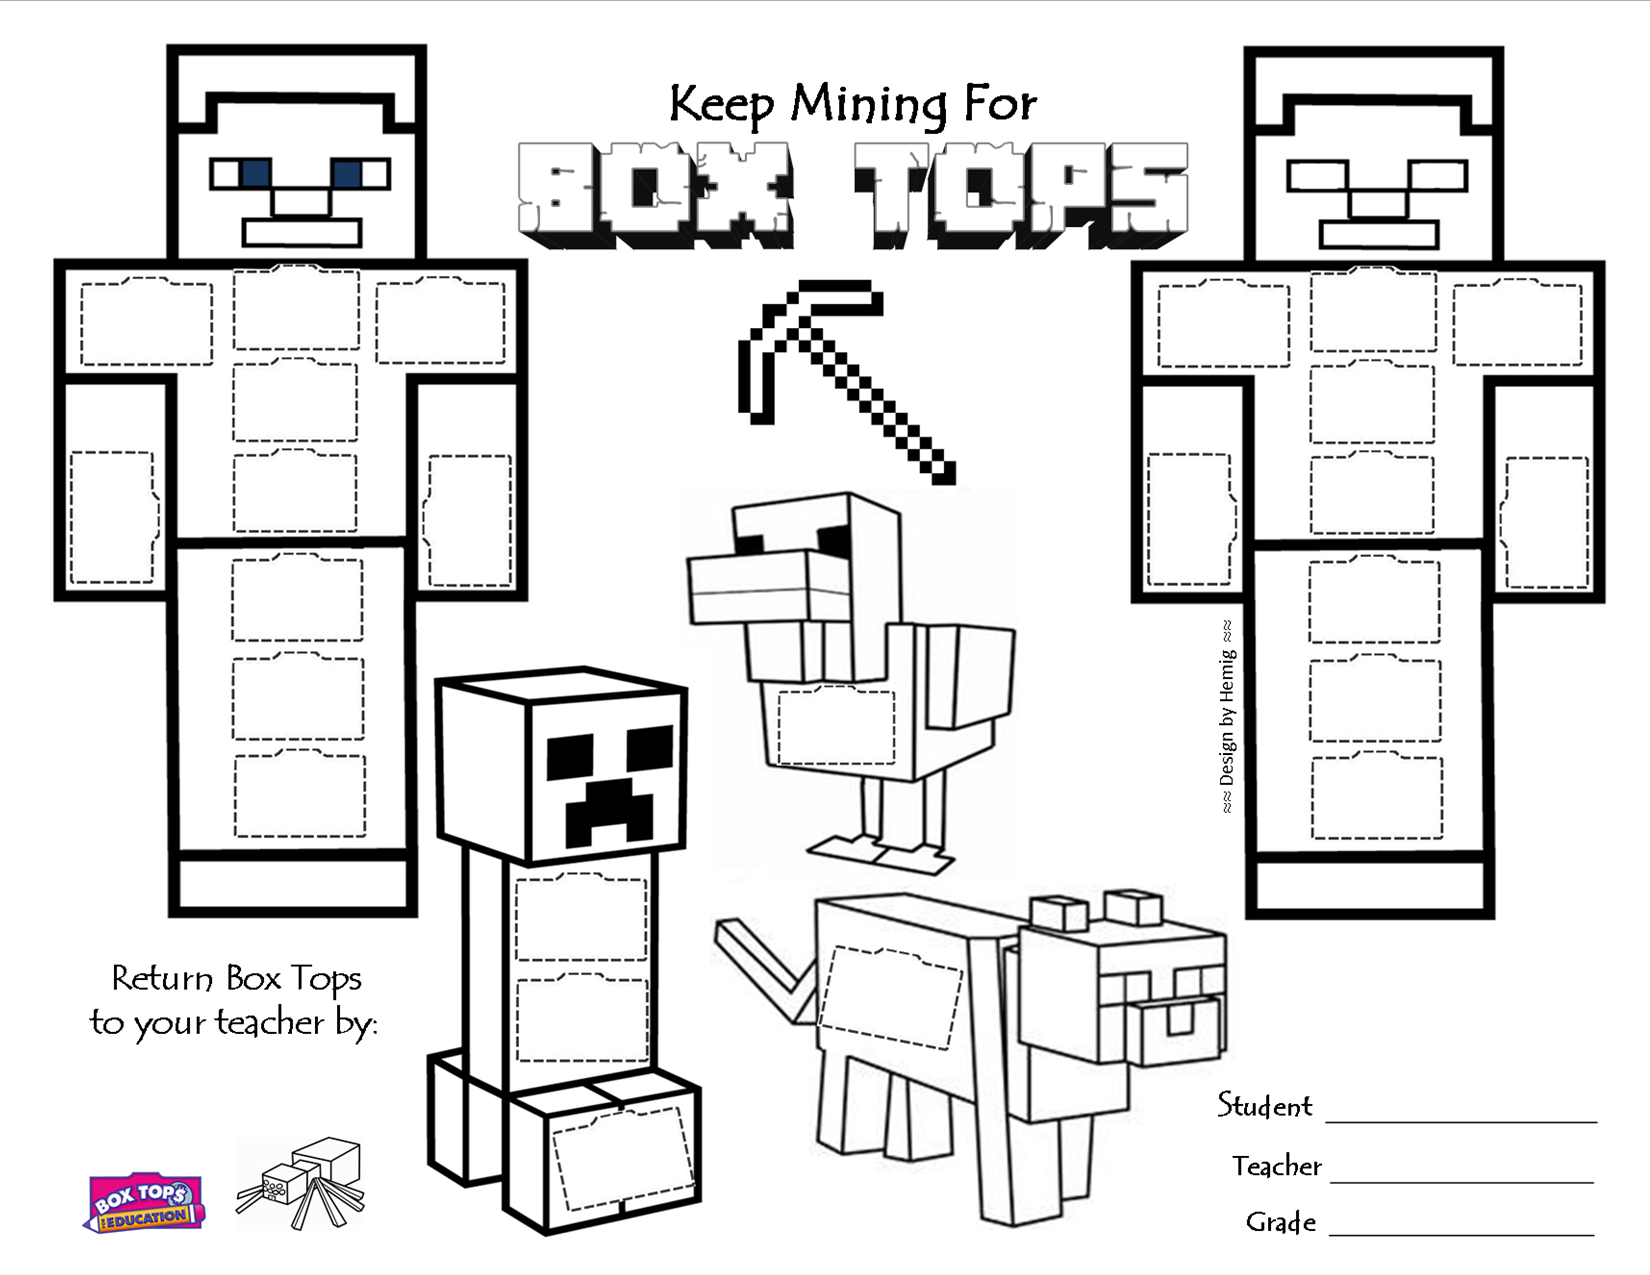 Minecraft Box Tops Collection Sheet Keep Mining For Box Tops 25ct Boxtops Btfe